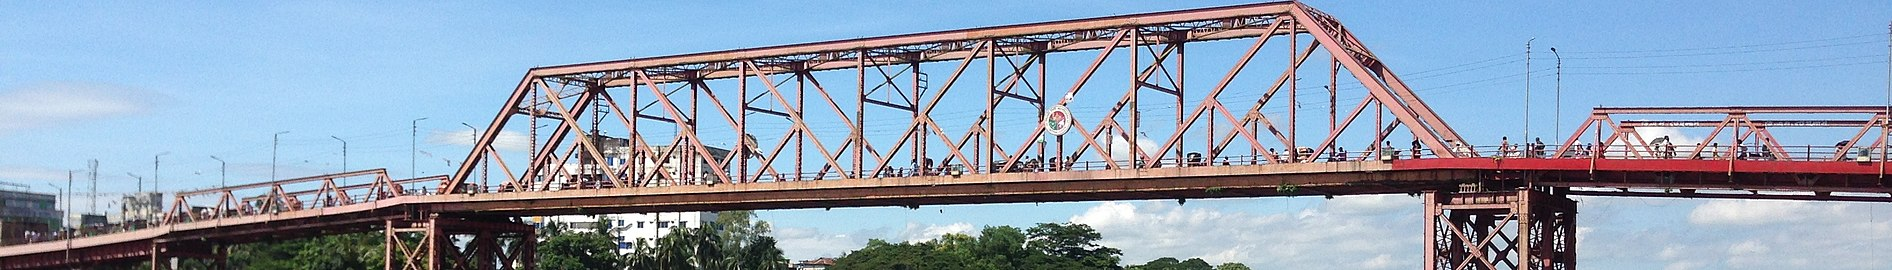 Keane Bridge (cropped).jpg